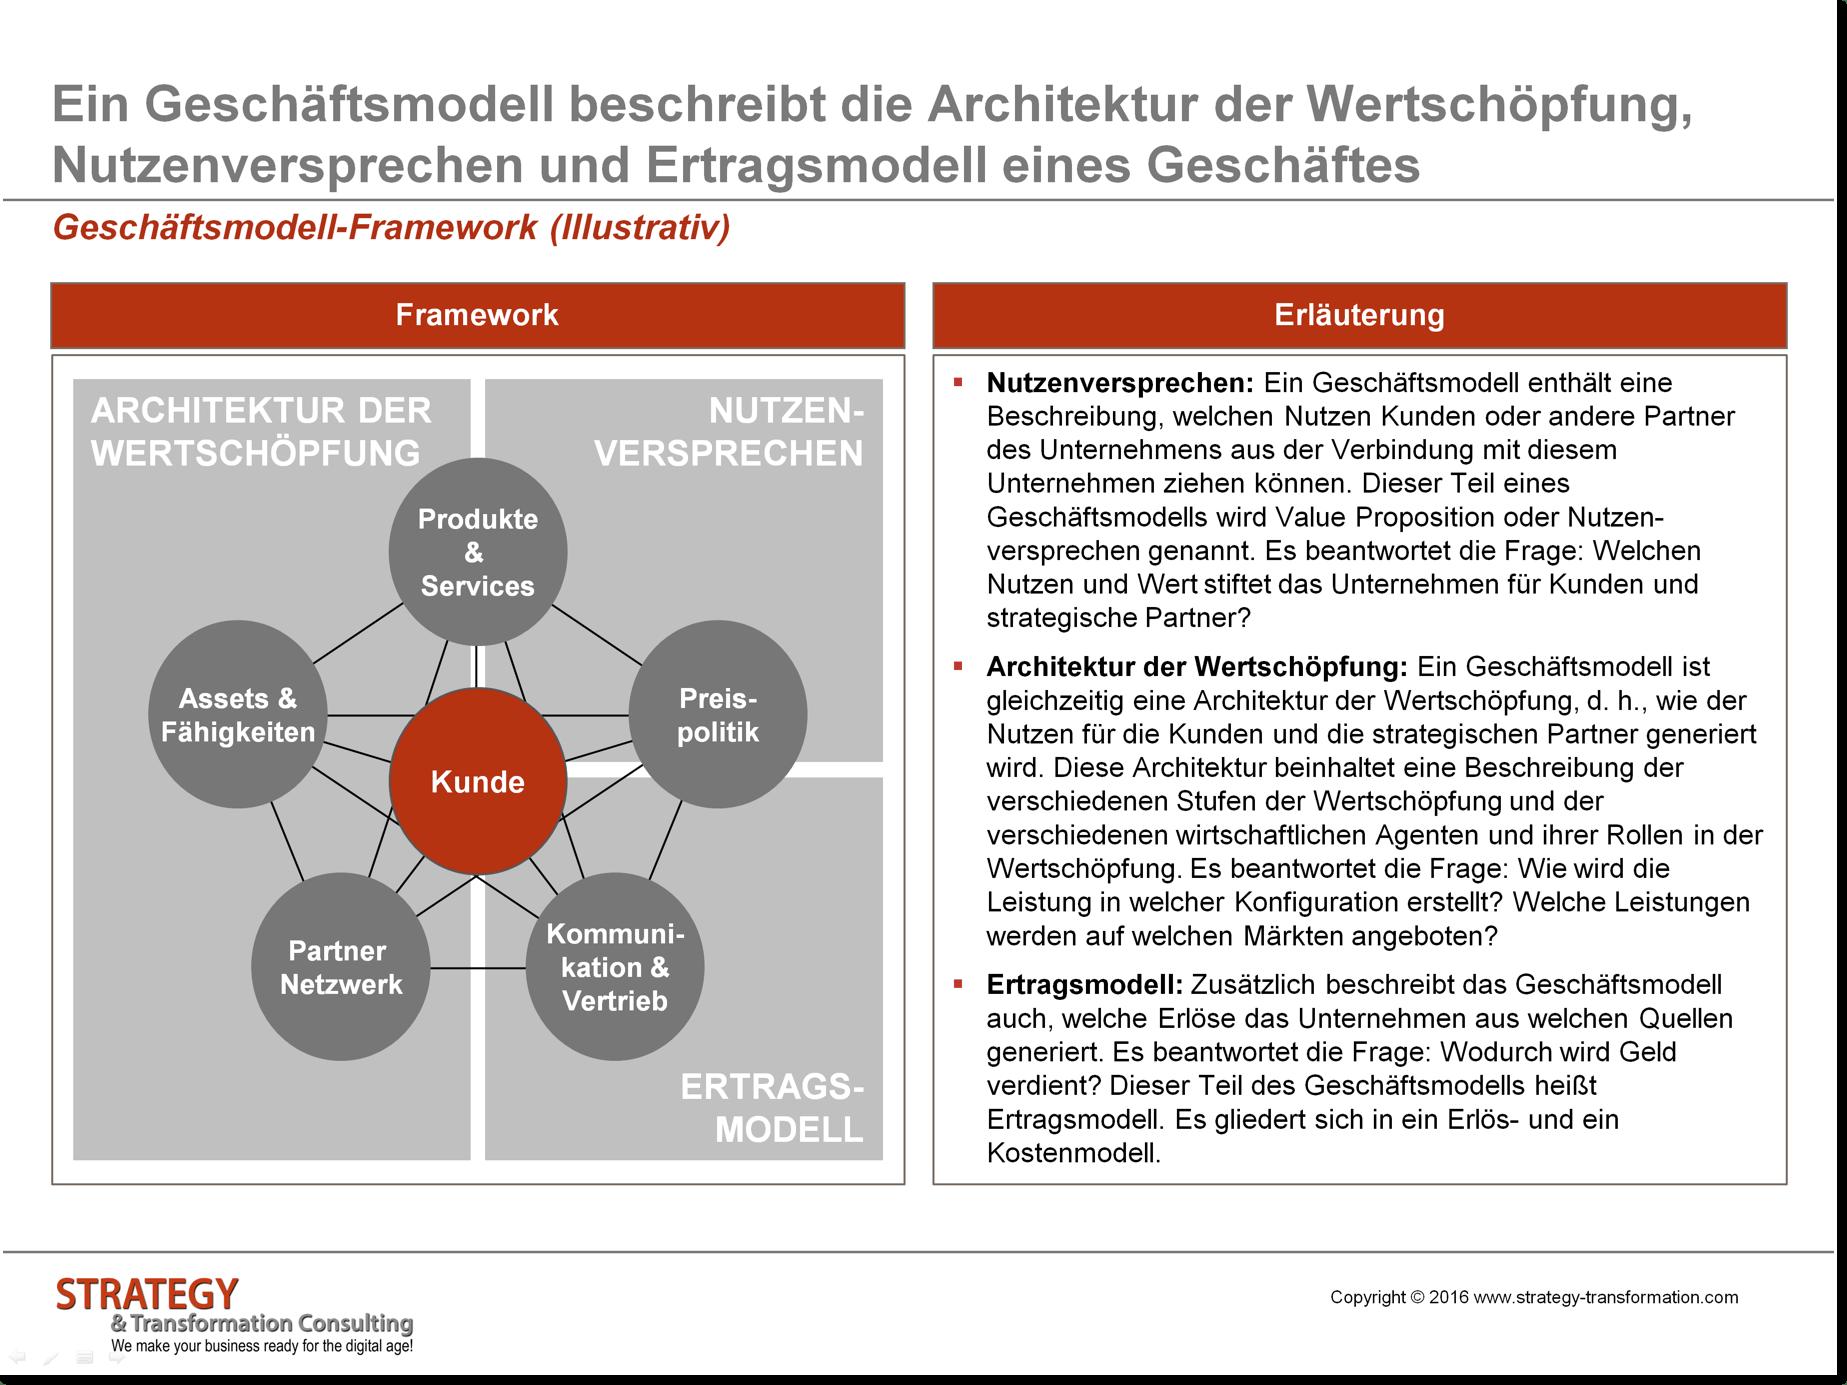 Geschäftsmodell-Framework